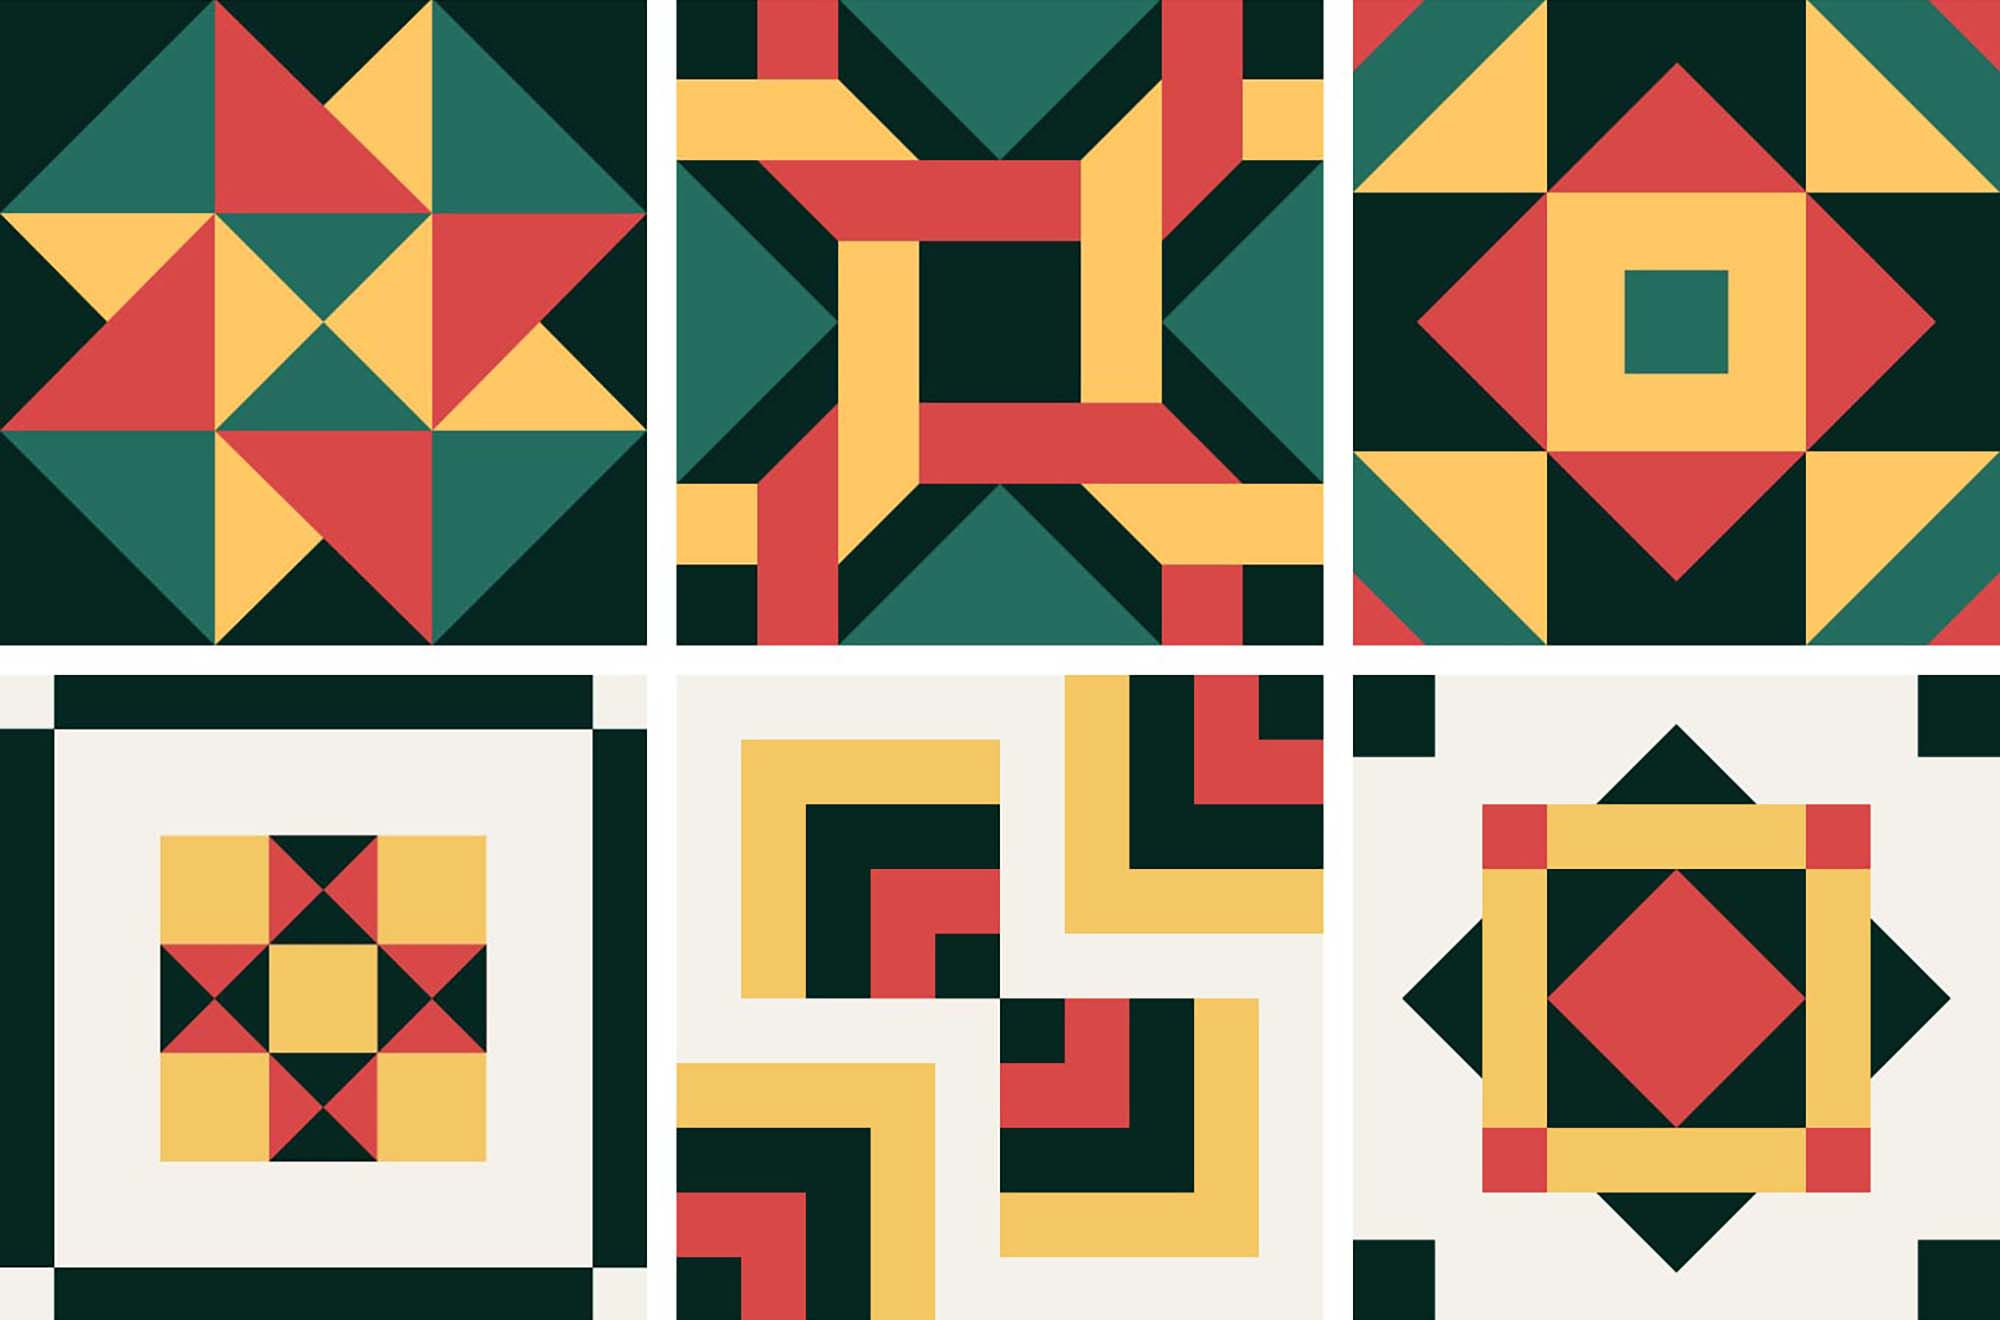 Portuguese Geometric Patterns 2